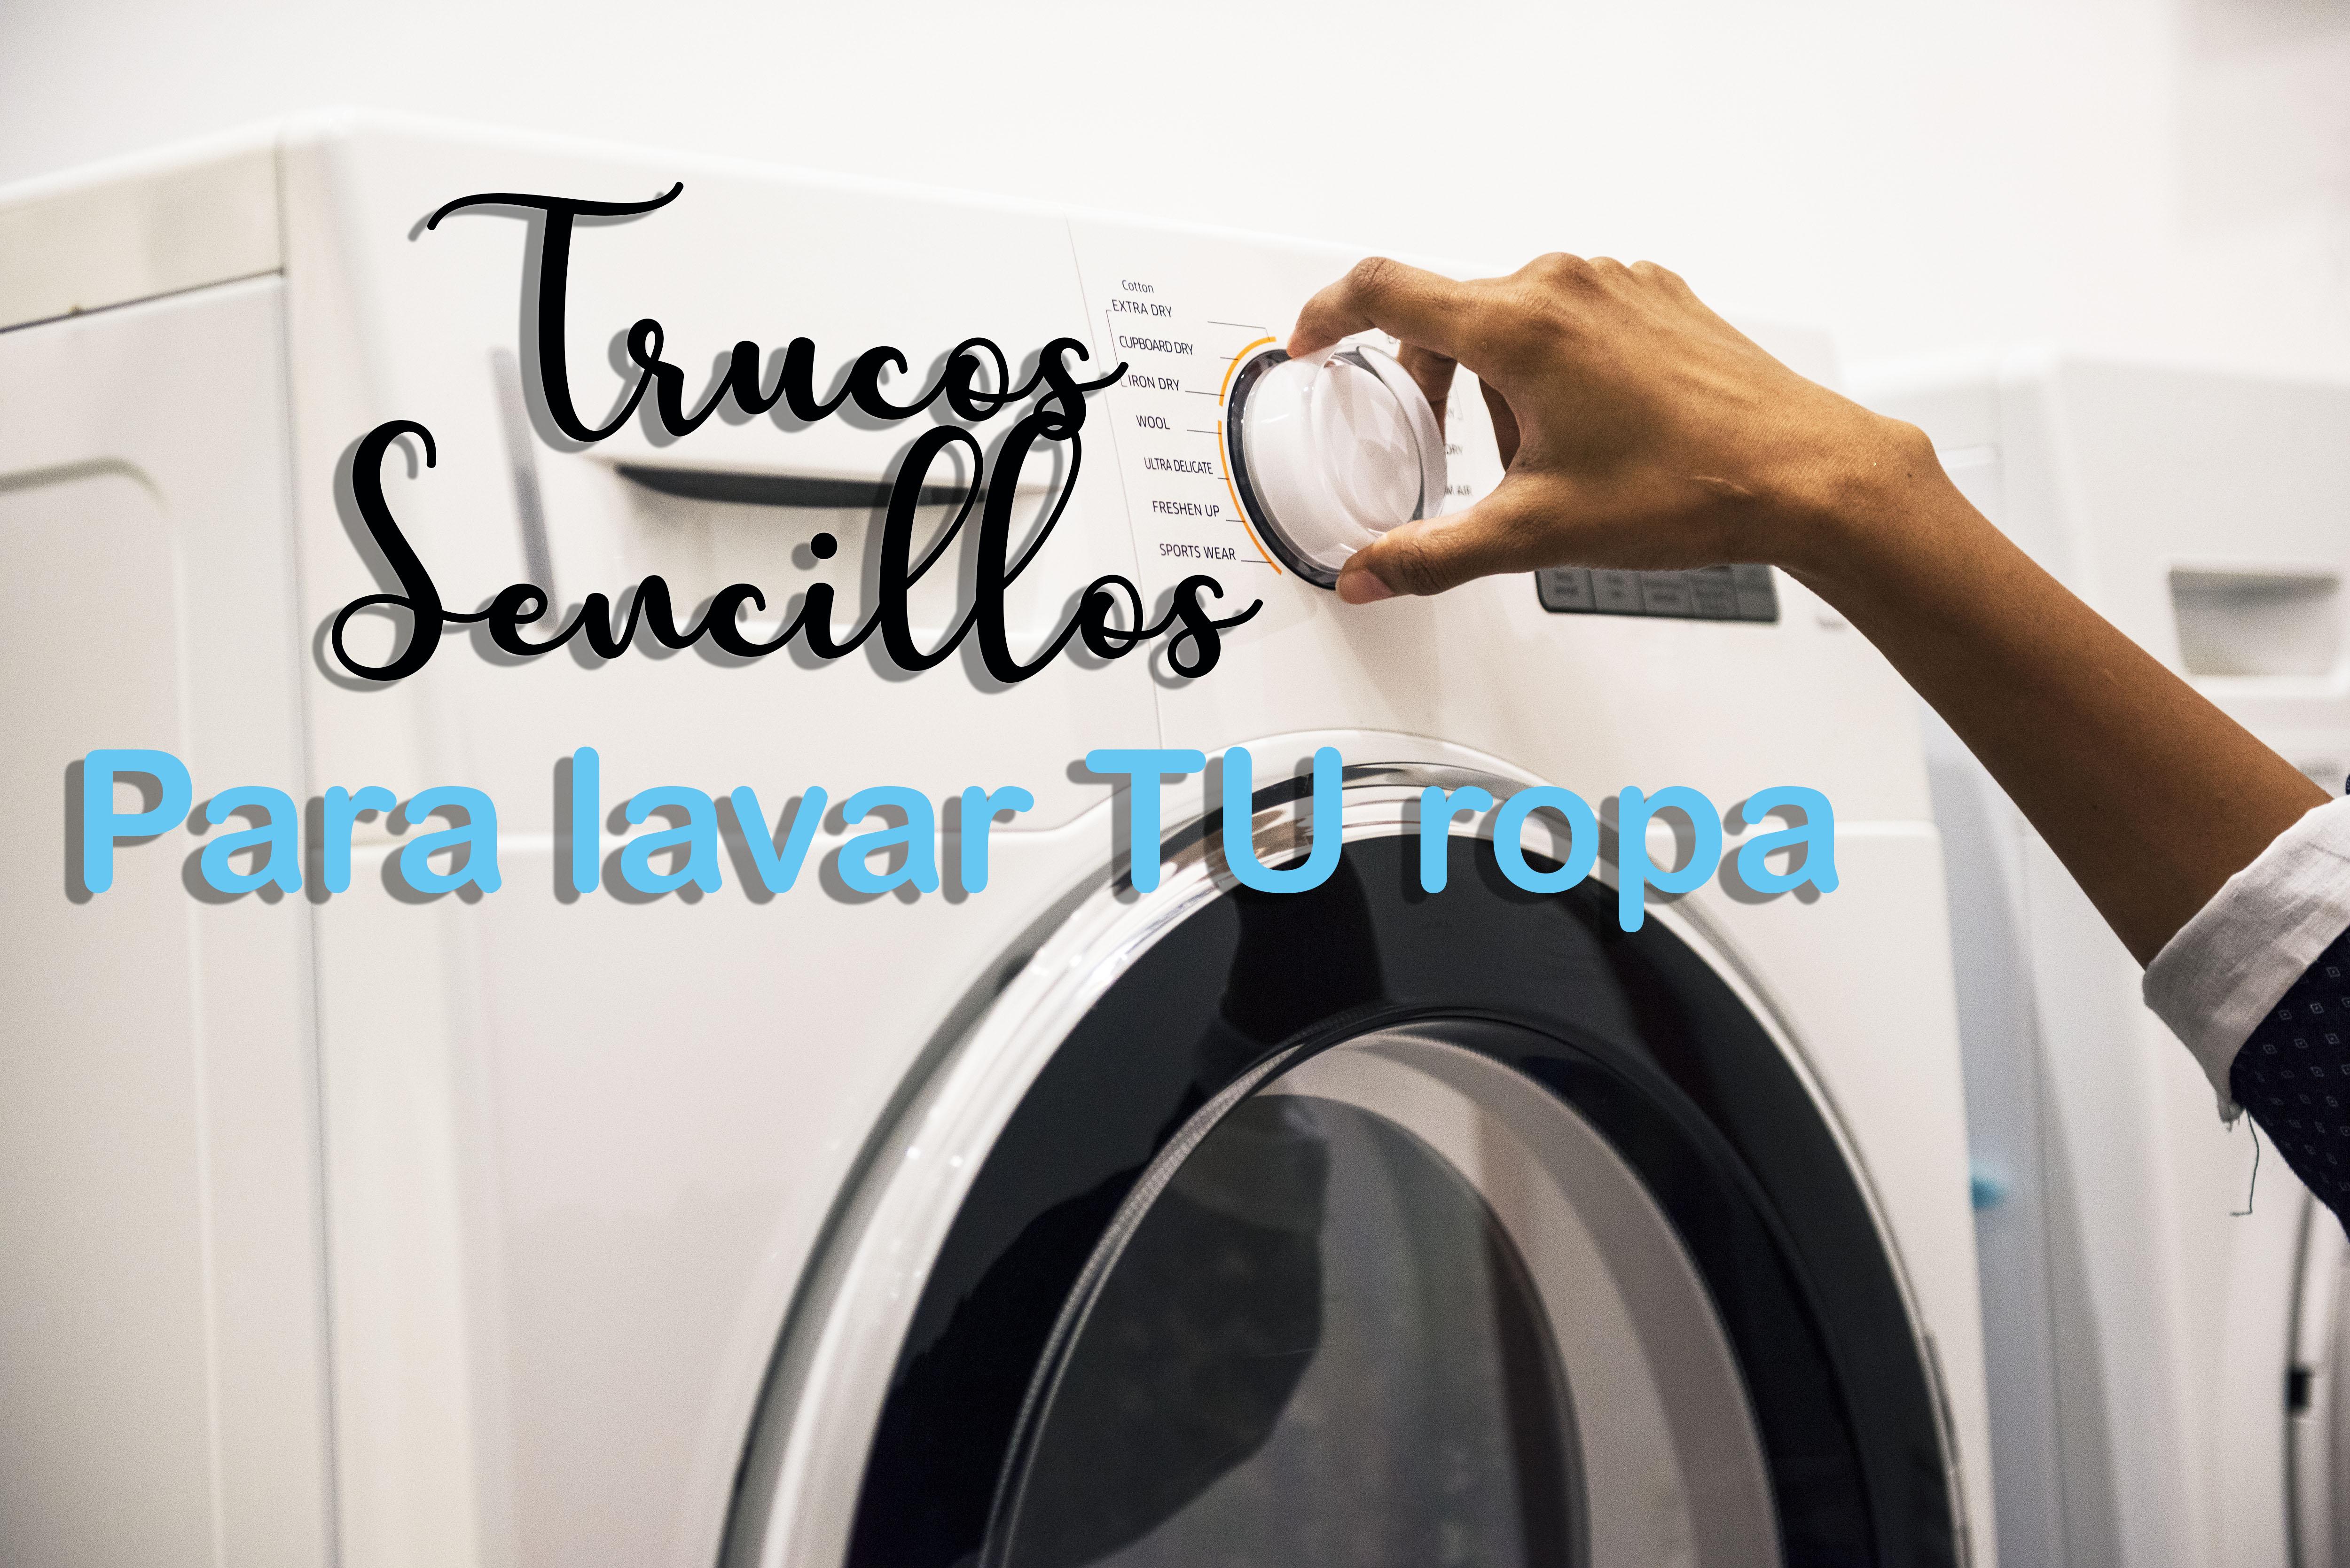 Trucos sencillos para lavar tu ropa